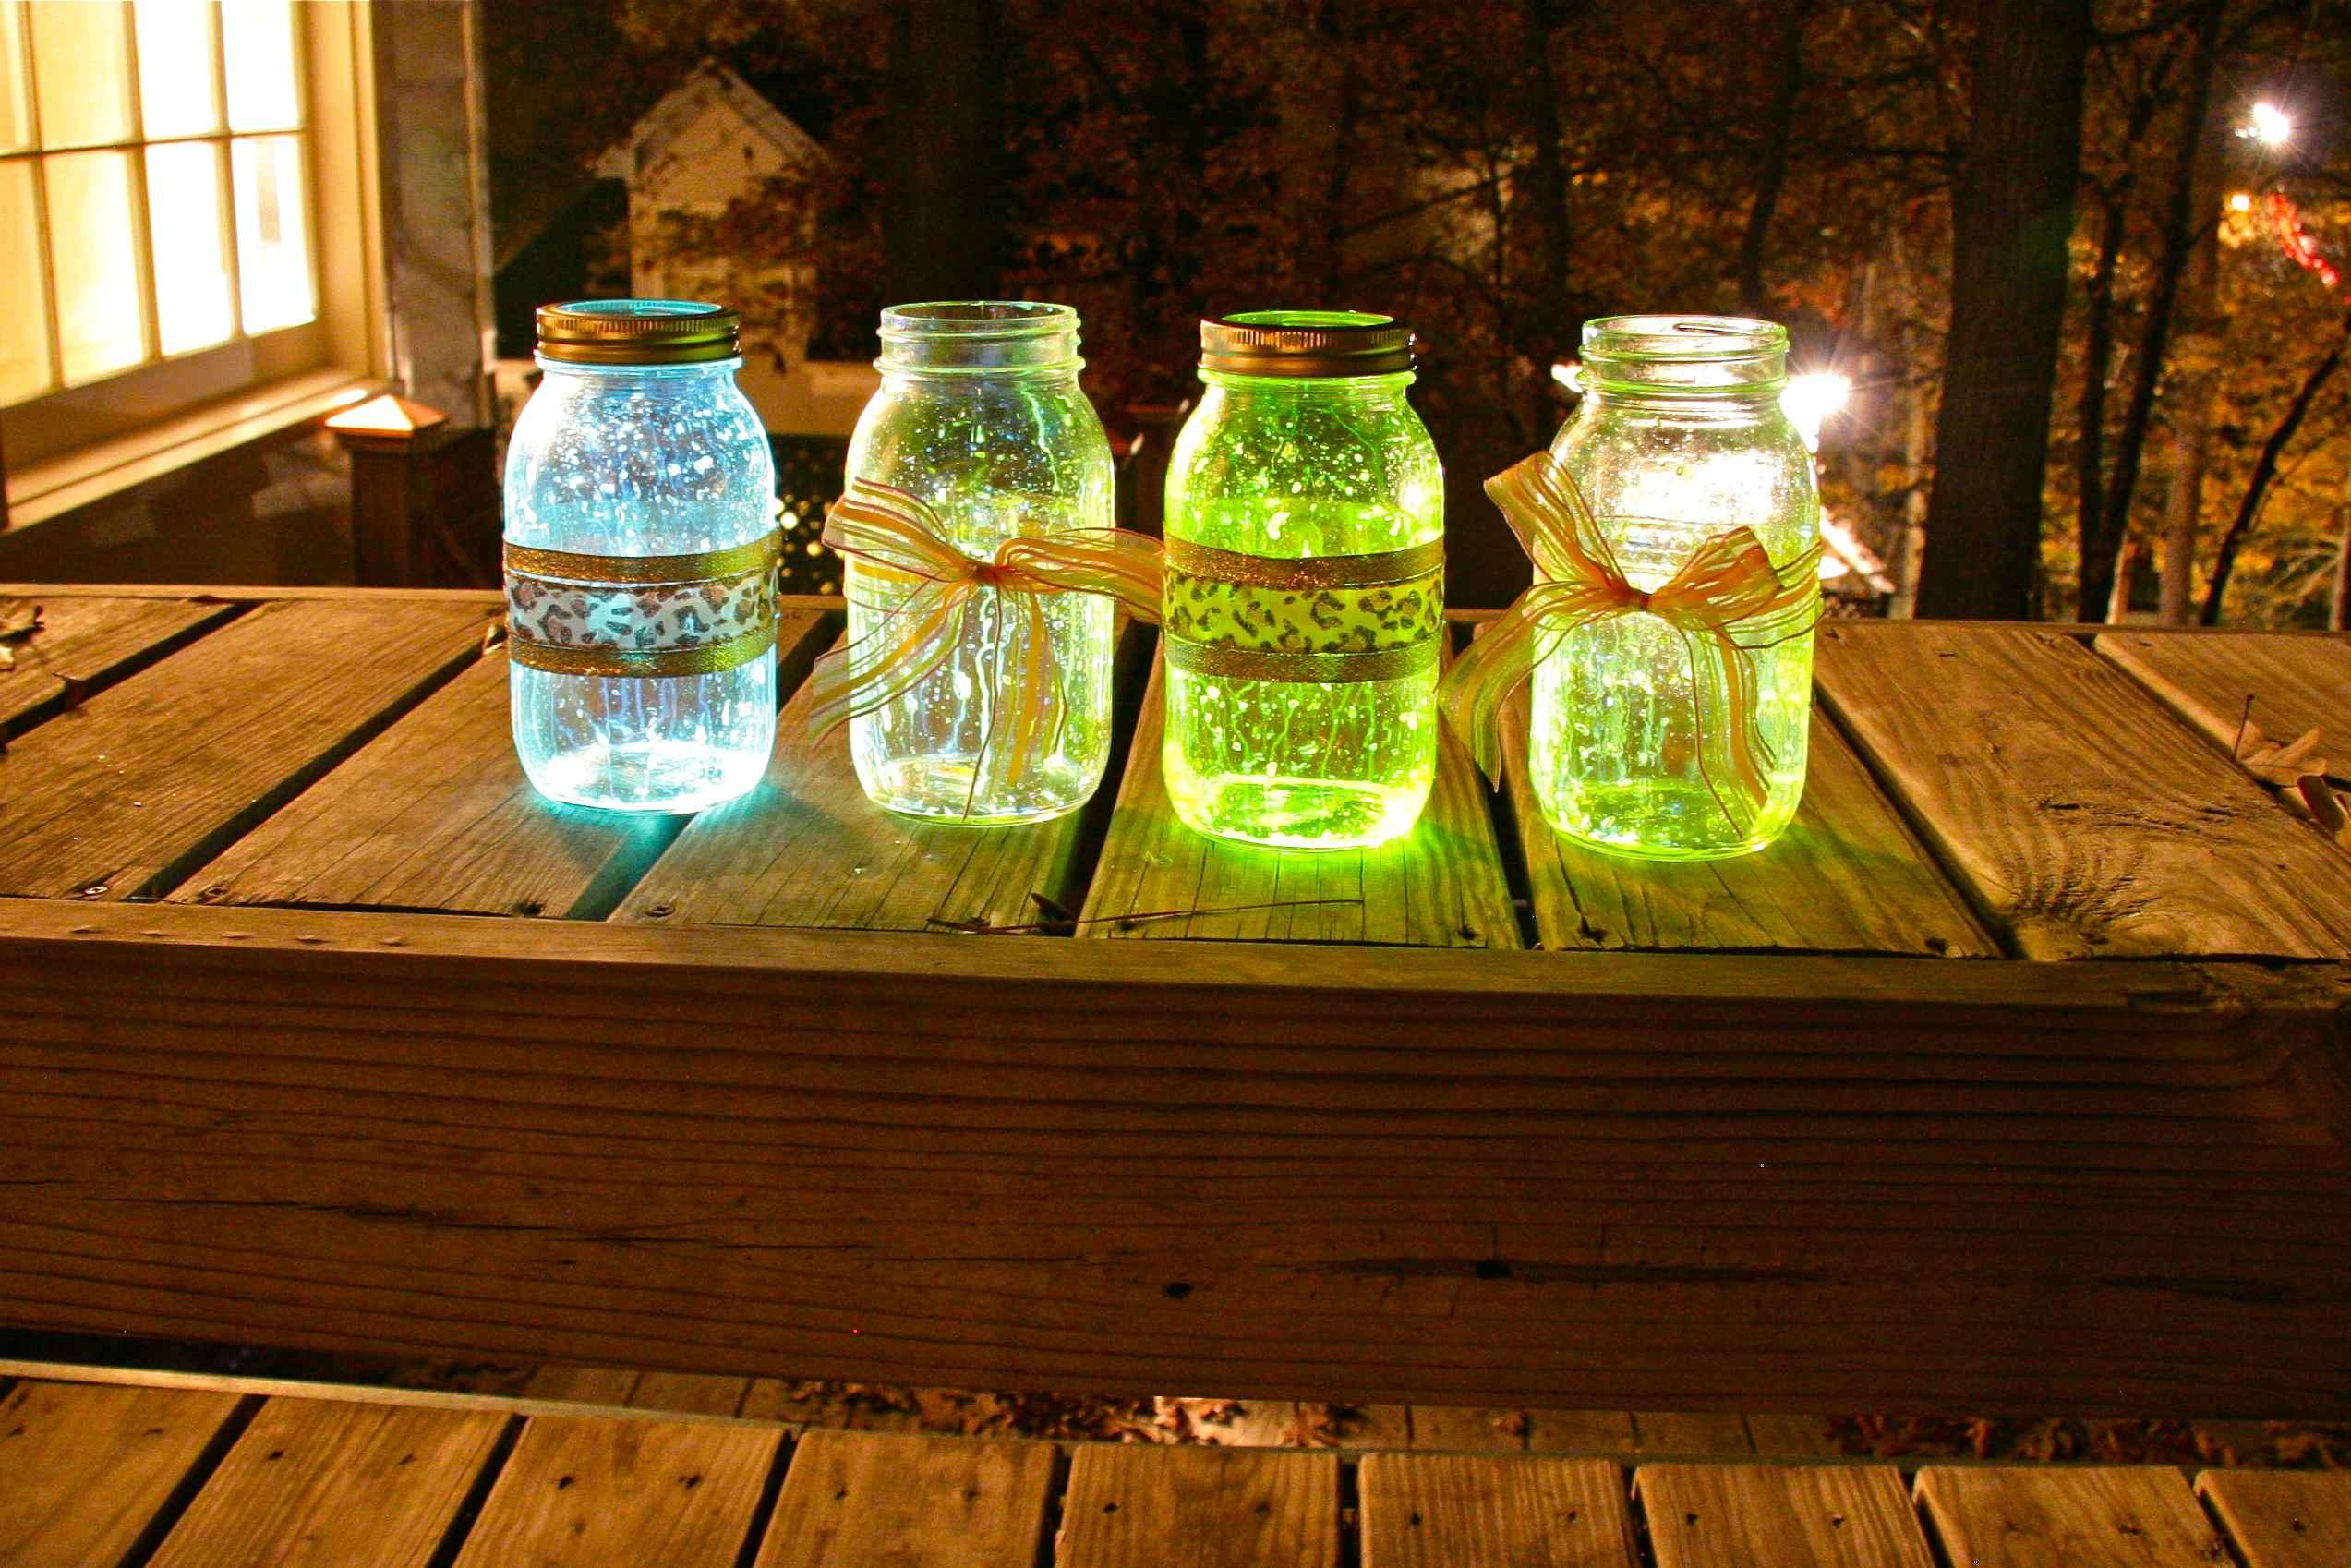 How to Make Easy Glow in the Dark Mason Jars